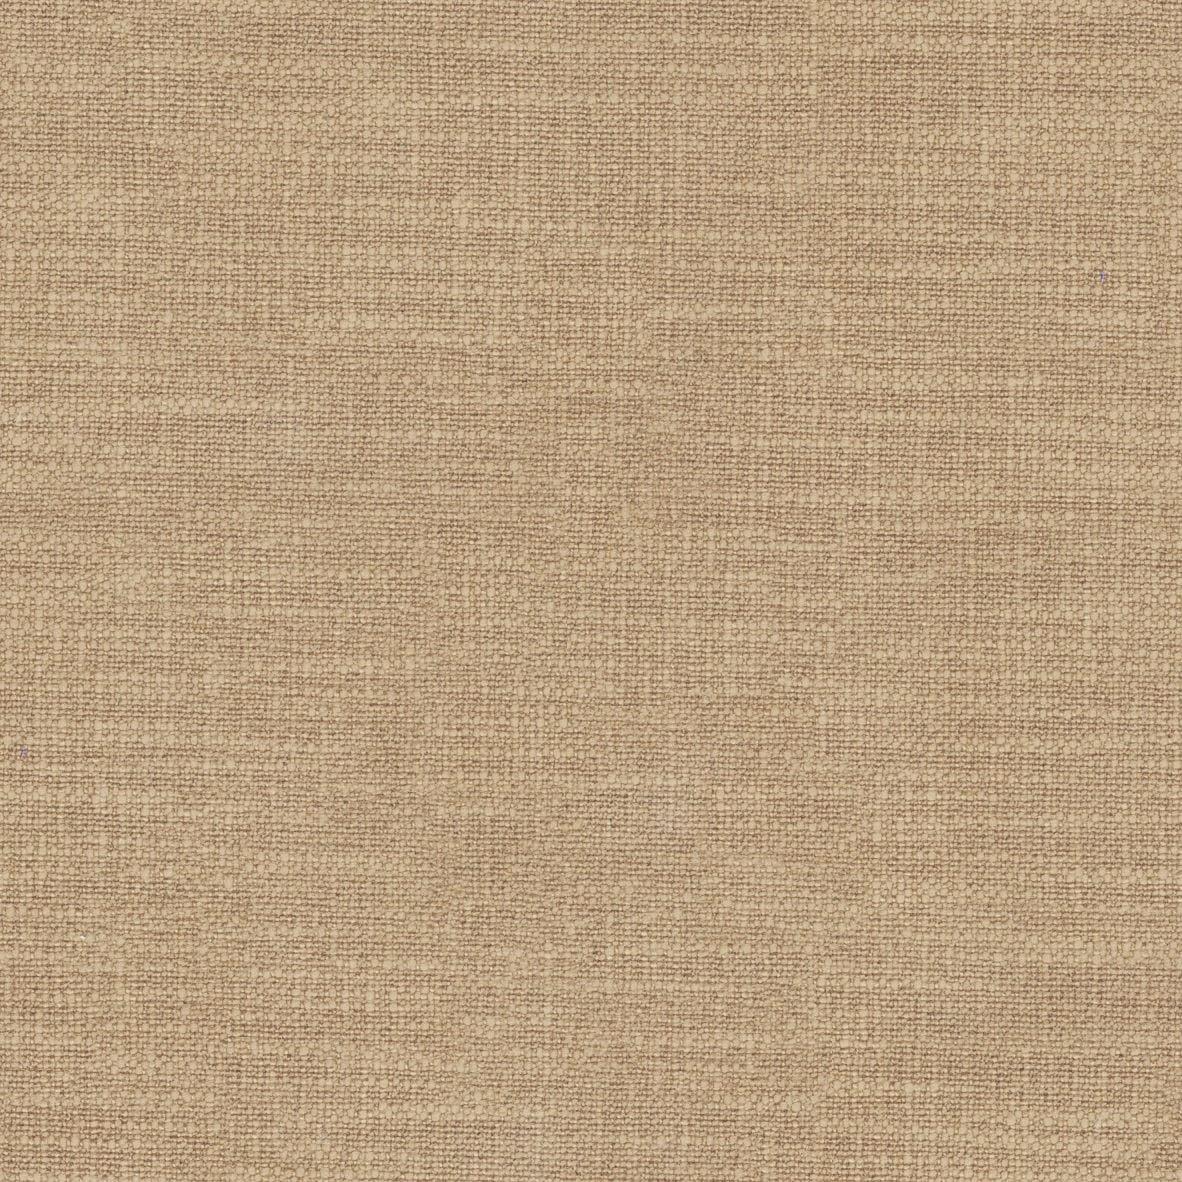 Texture tessuto - Imagui